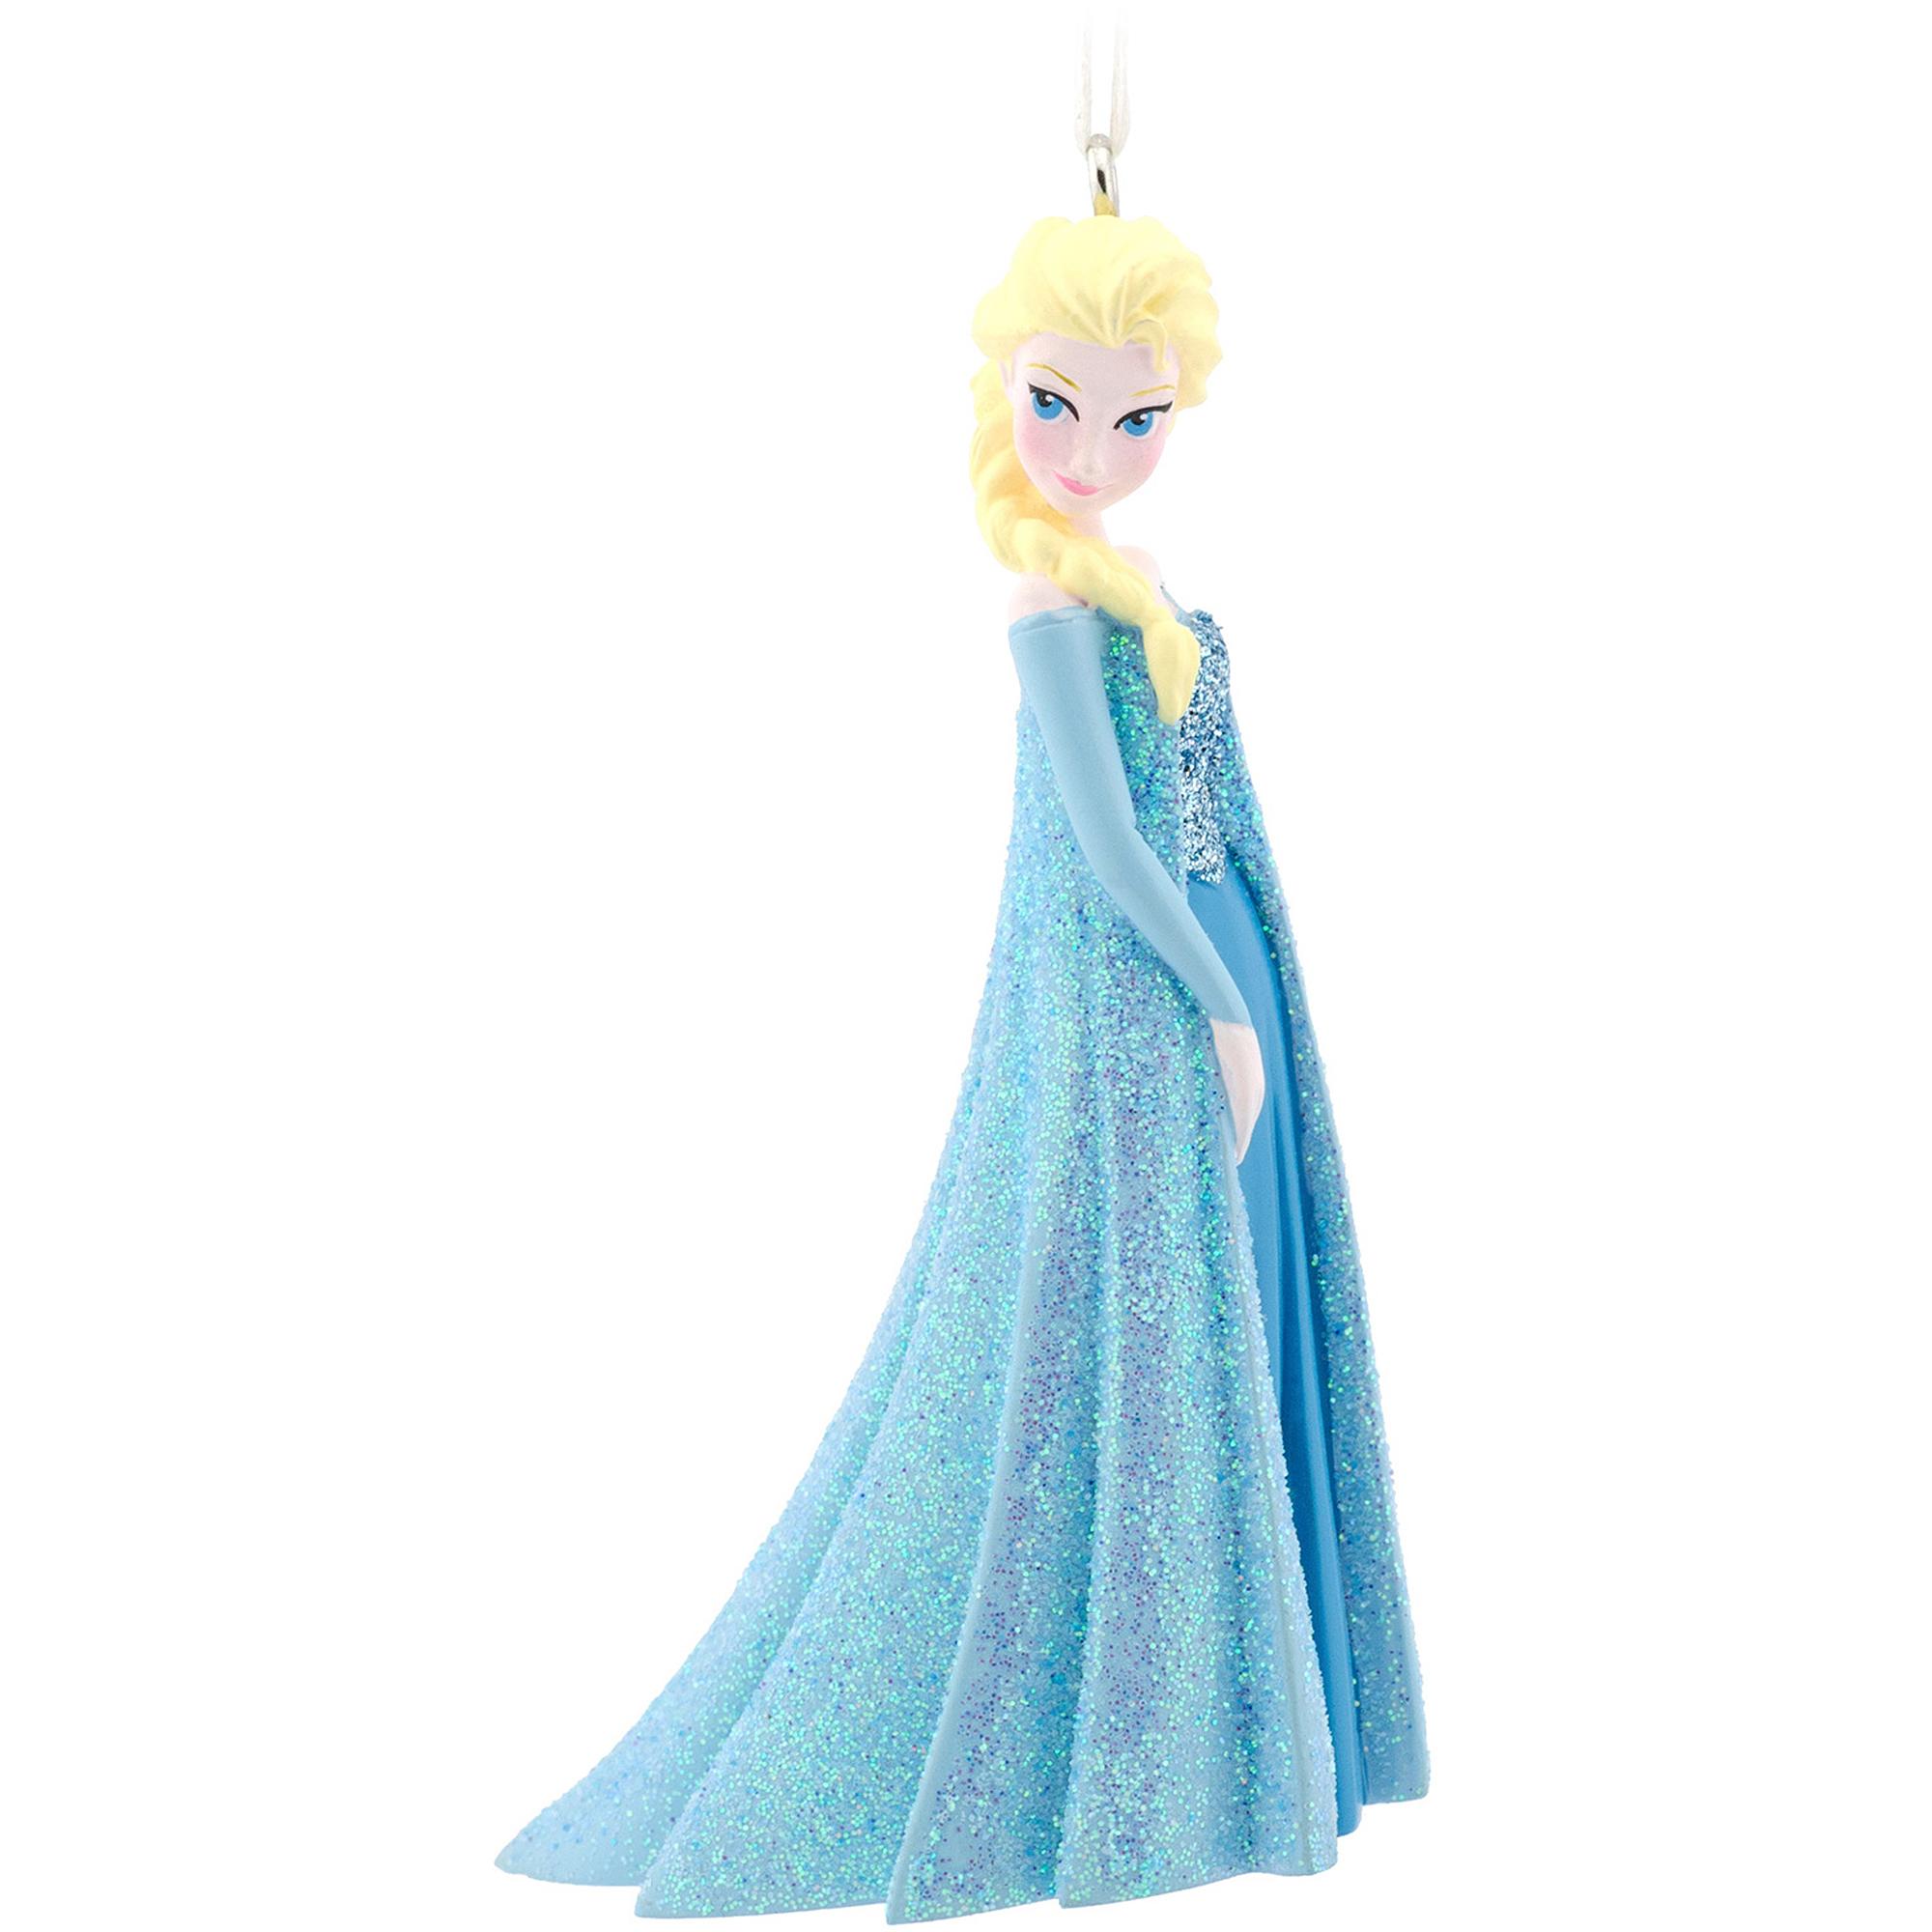 Wondrous Hallmark Disney Frozen Princess Elsa Christmas Ornament Walmart Com Easy Diy Christmas Decorations Tissureus